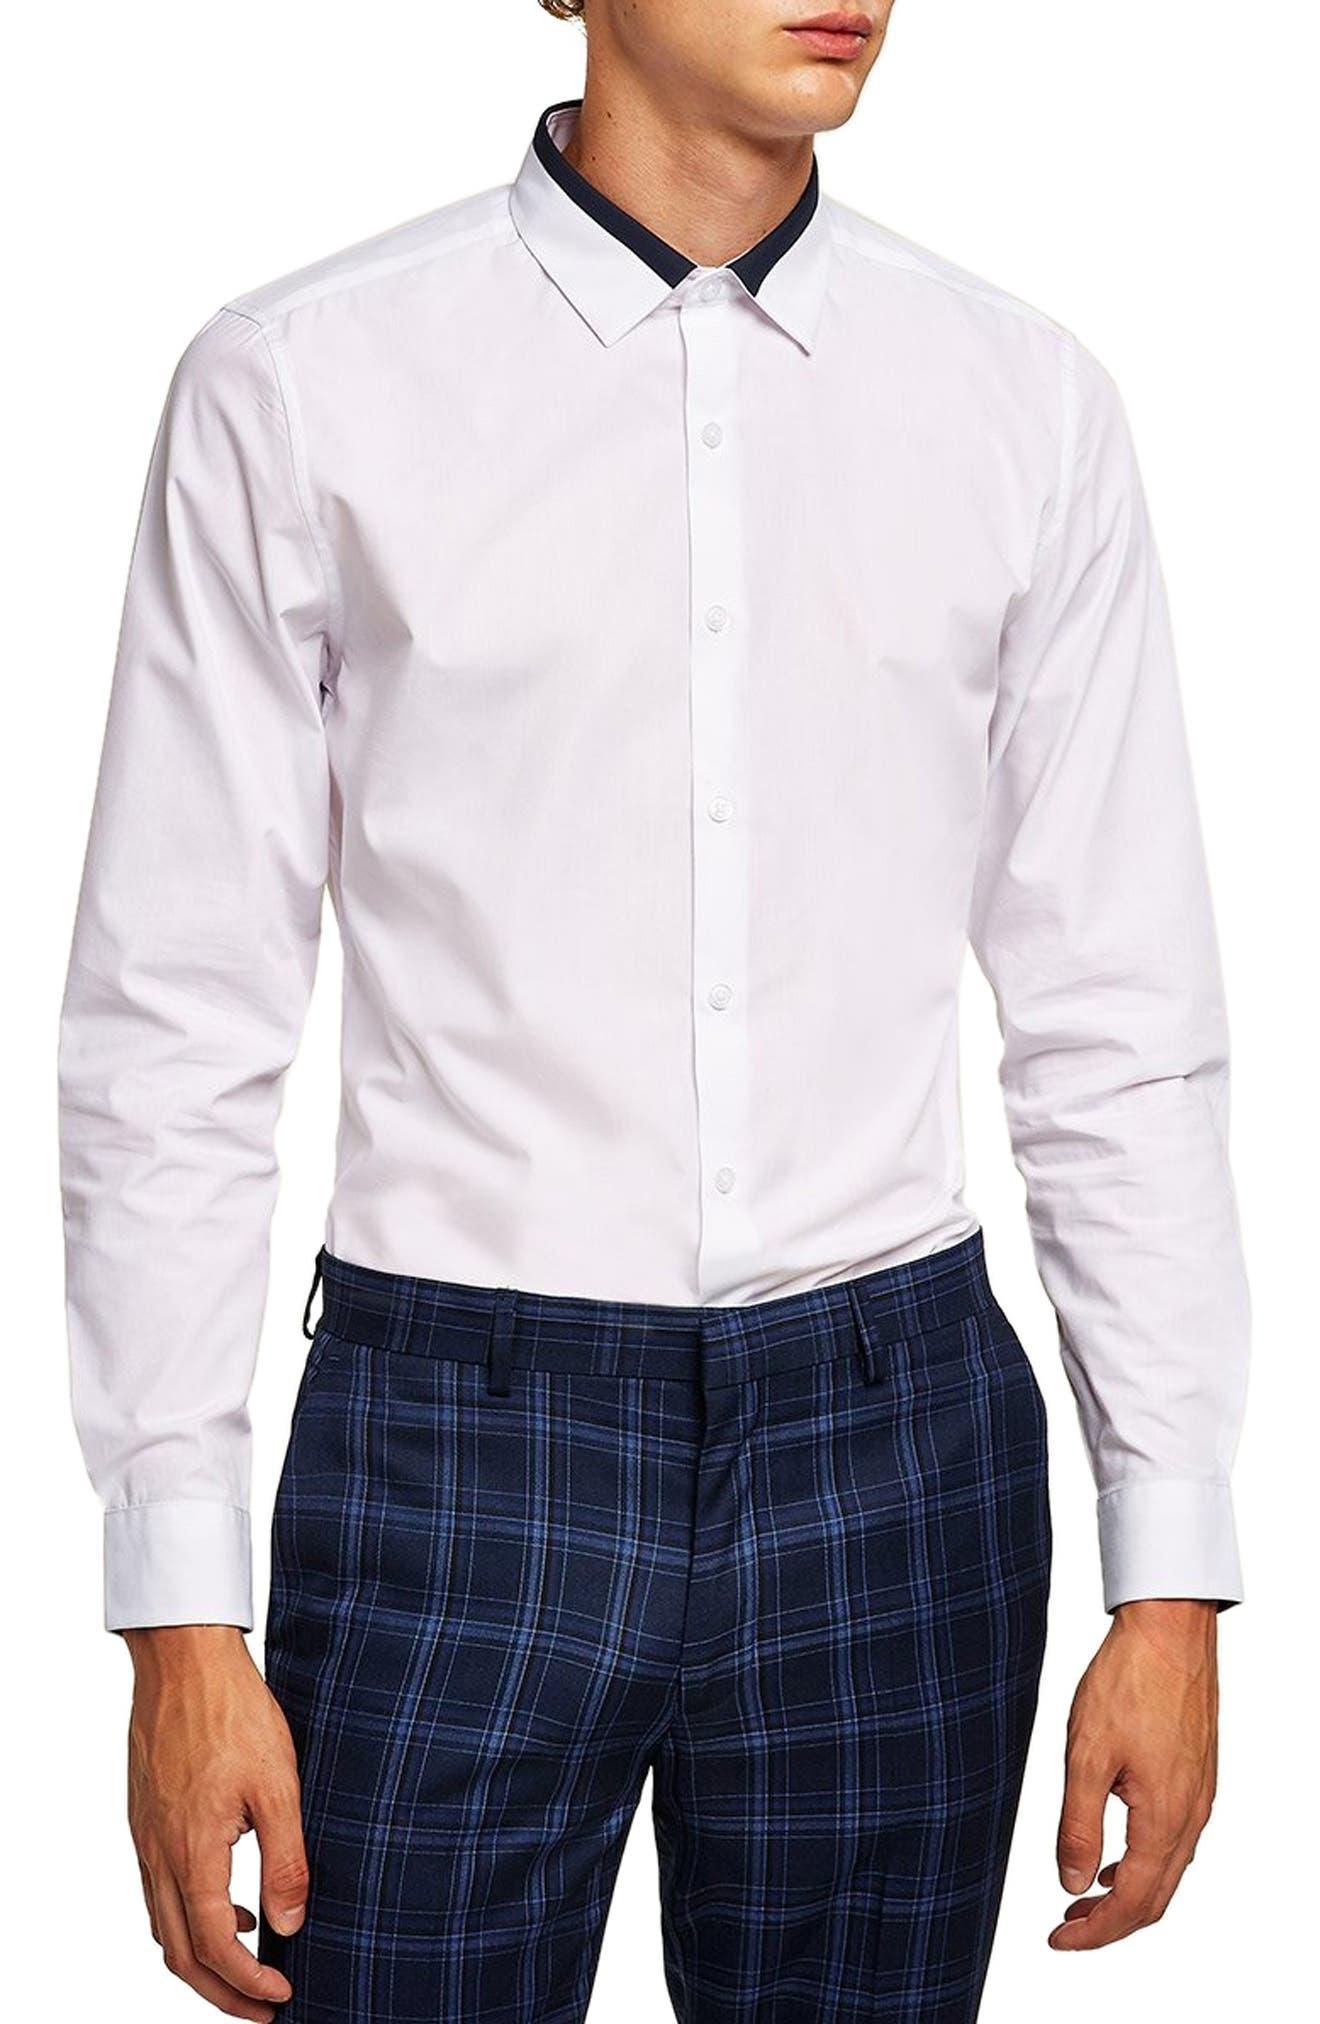 Slim Fit Panel Collar Shirt,                             Main thumbnail 1, color,                             100